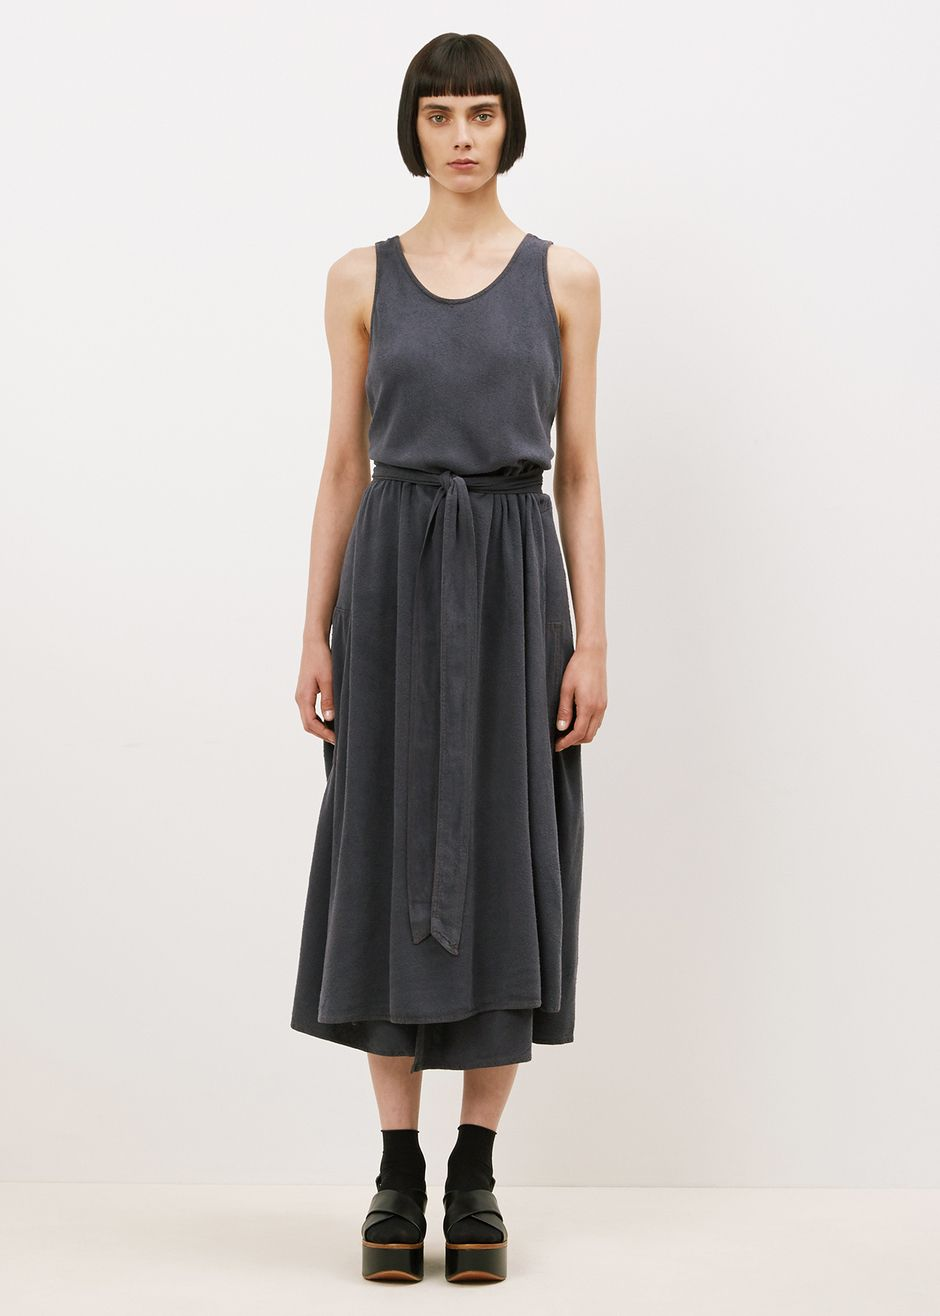 5e338aa93641 Black Crane Wrap Dress (Midnight) | Sewing inspiration | Dresses ...